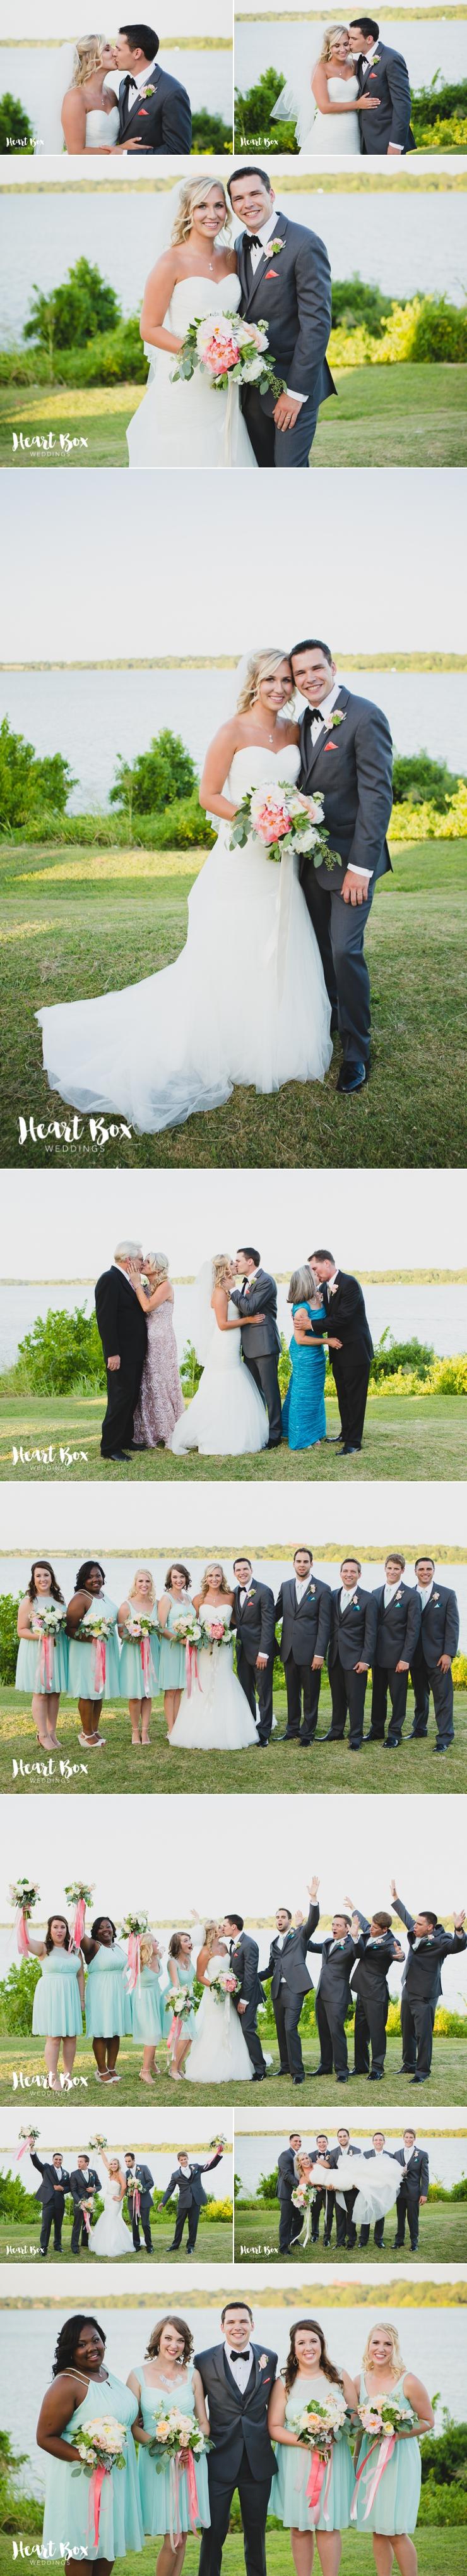 Gould Wedding Blog Collages 15.jpg